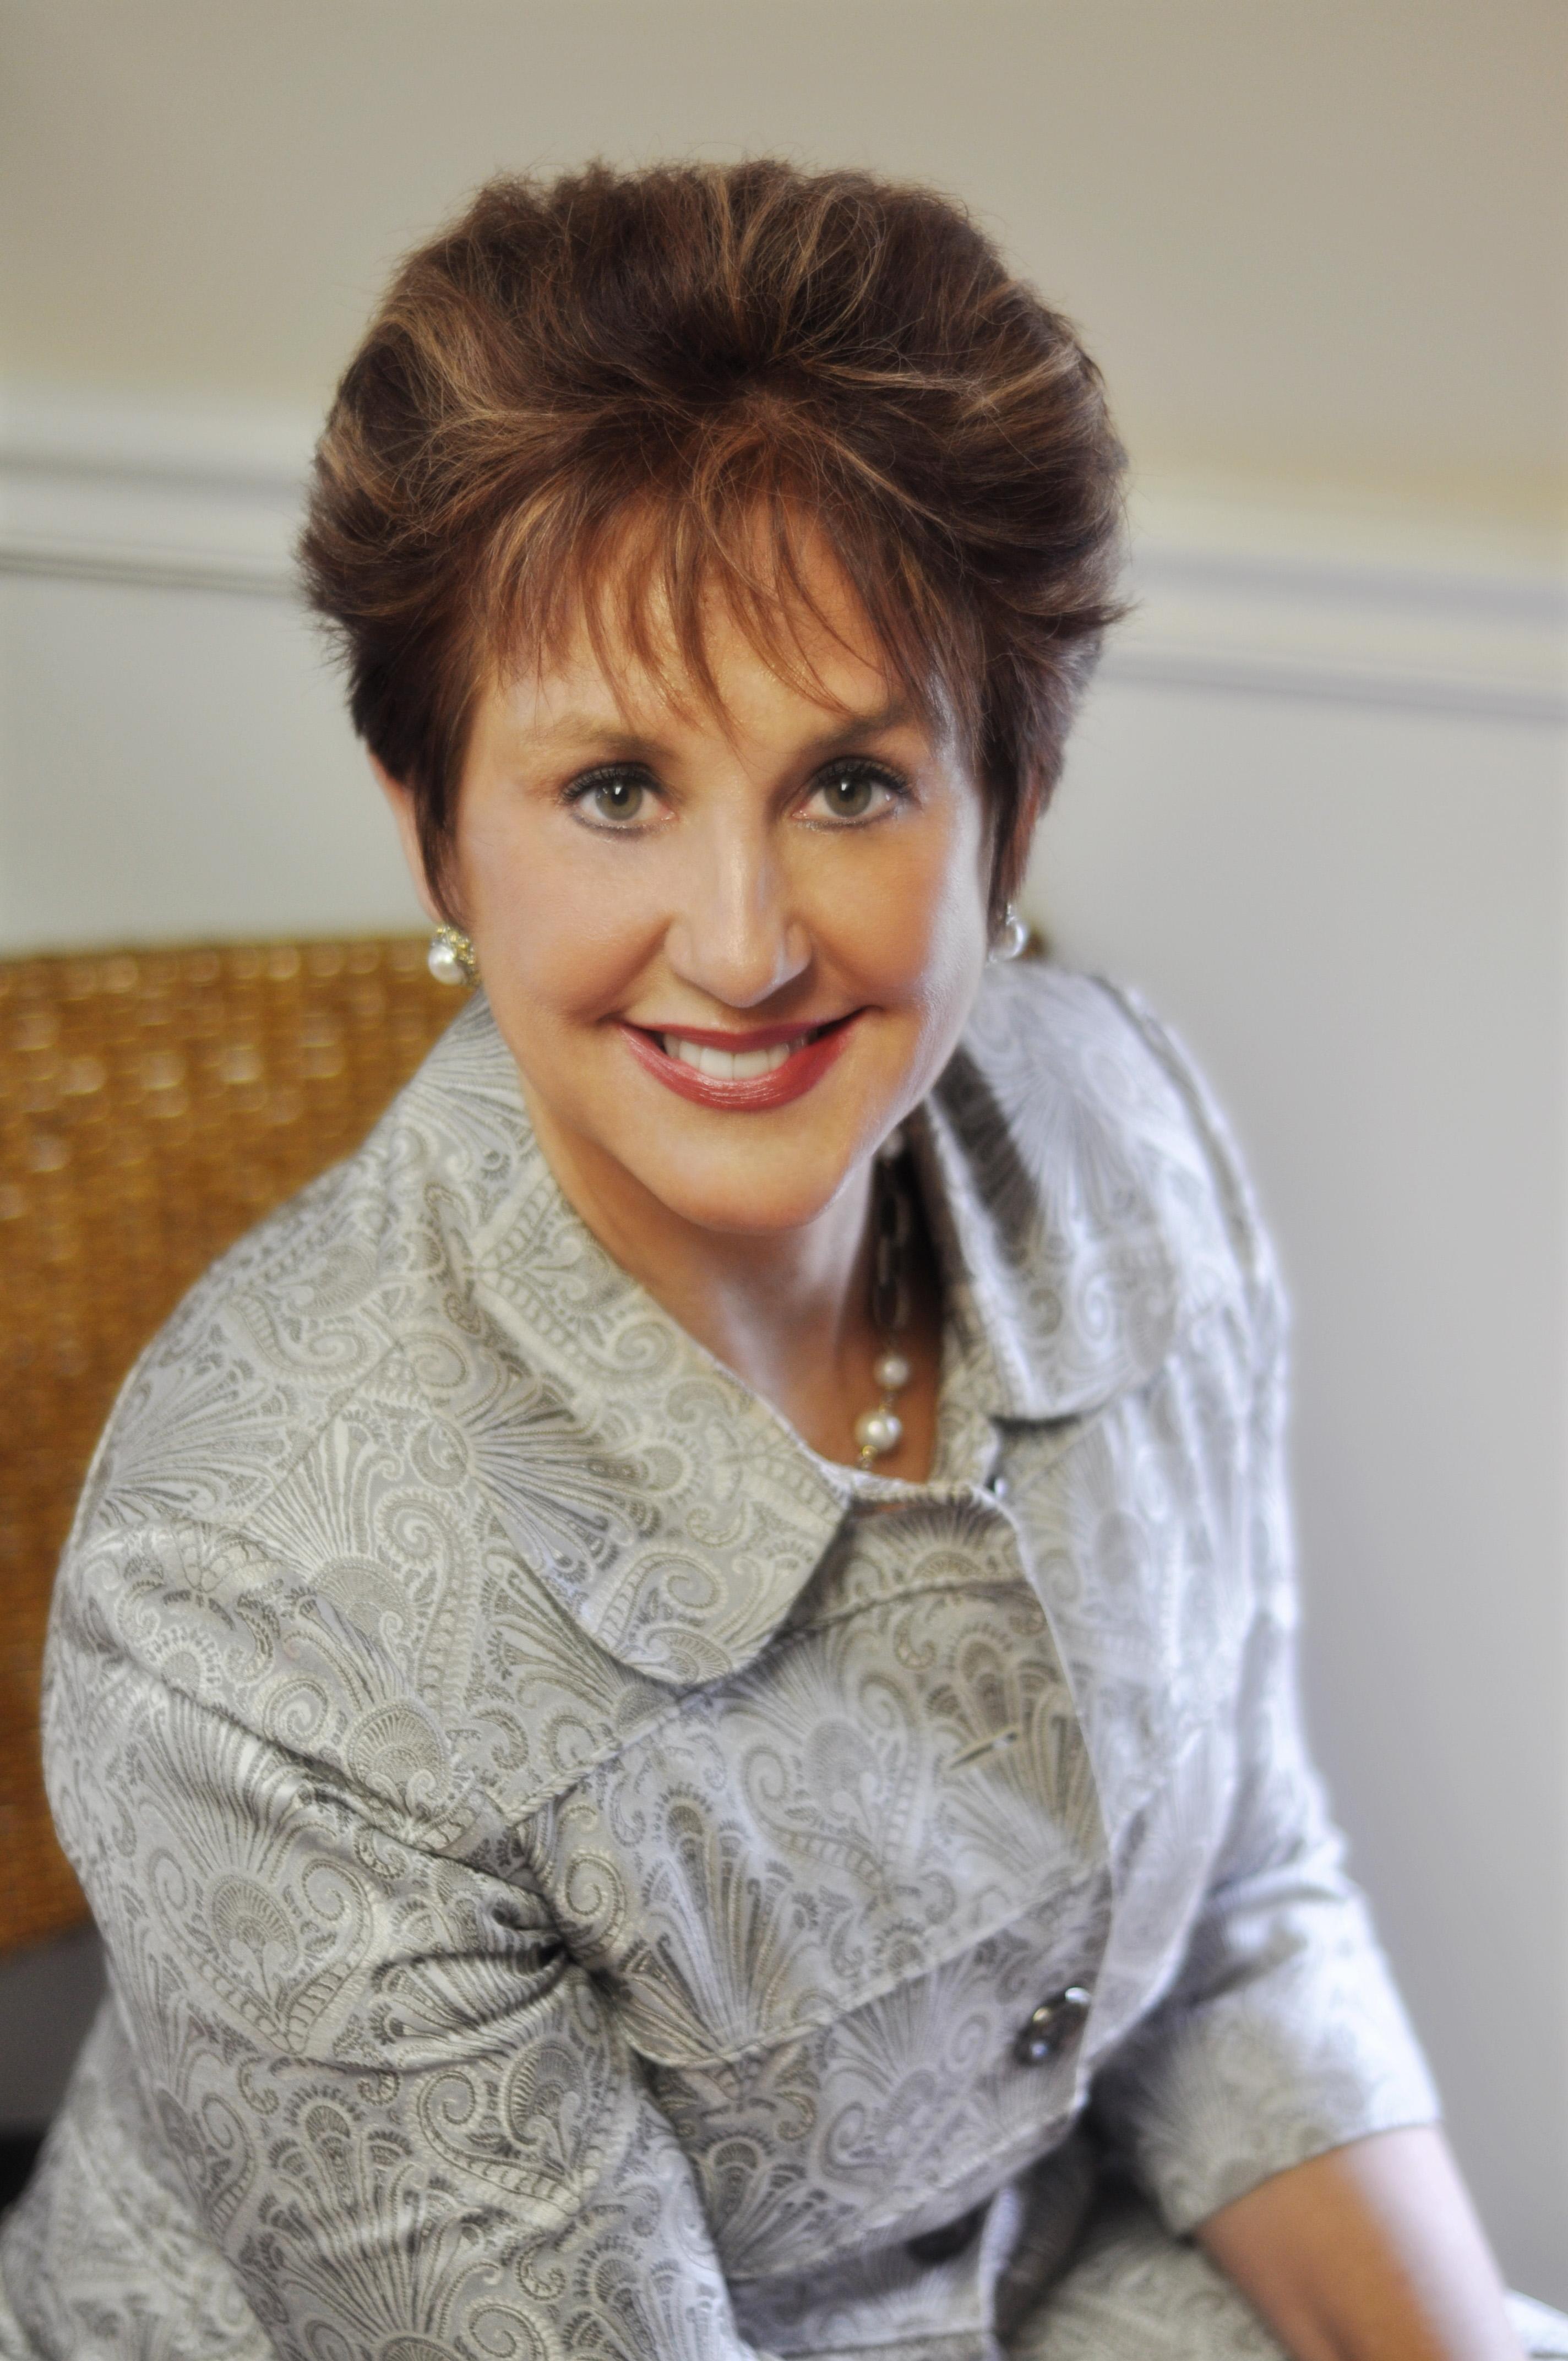 Cynthia Cobb